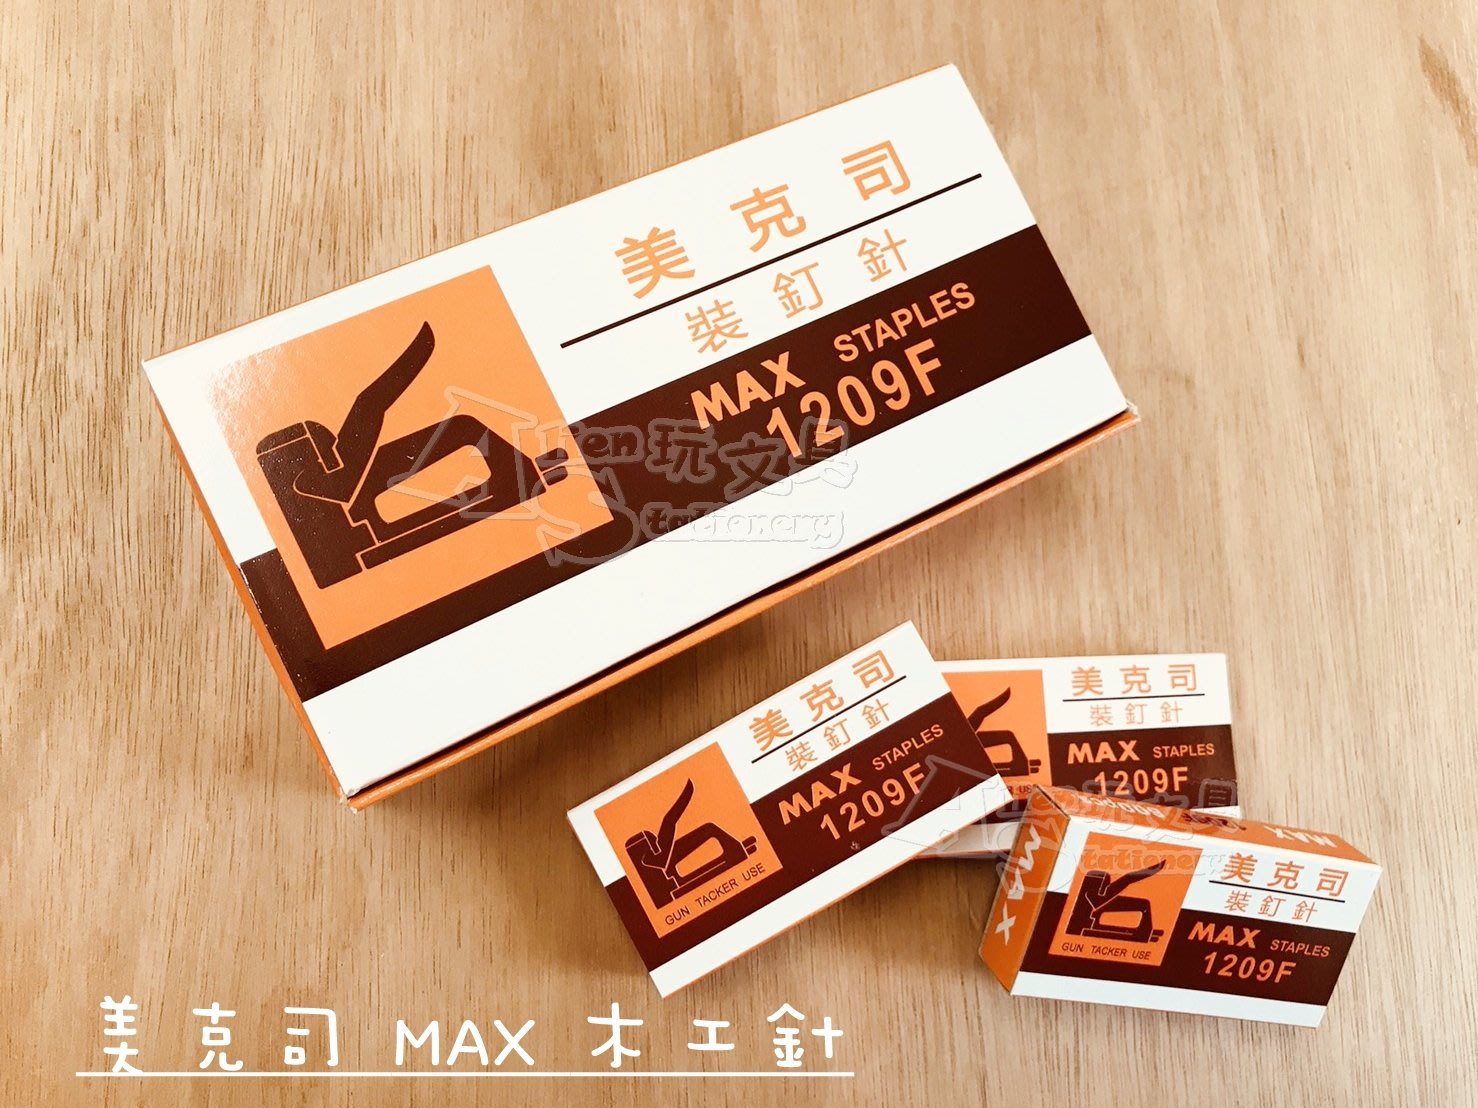 MAX 1209F 釘槍訂書針 木工機專用針木工針 Alien玩文具